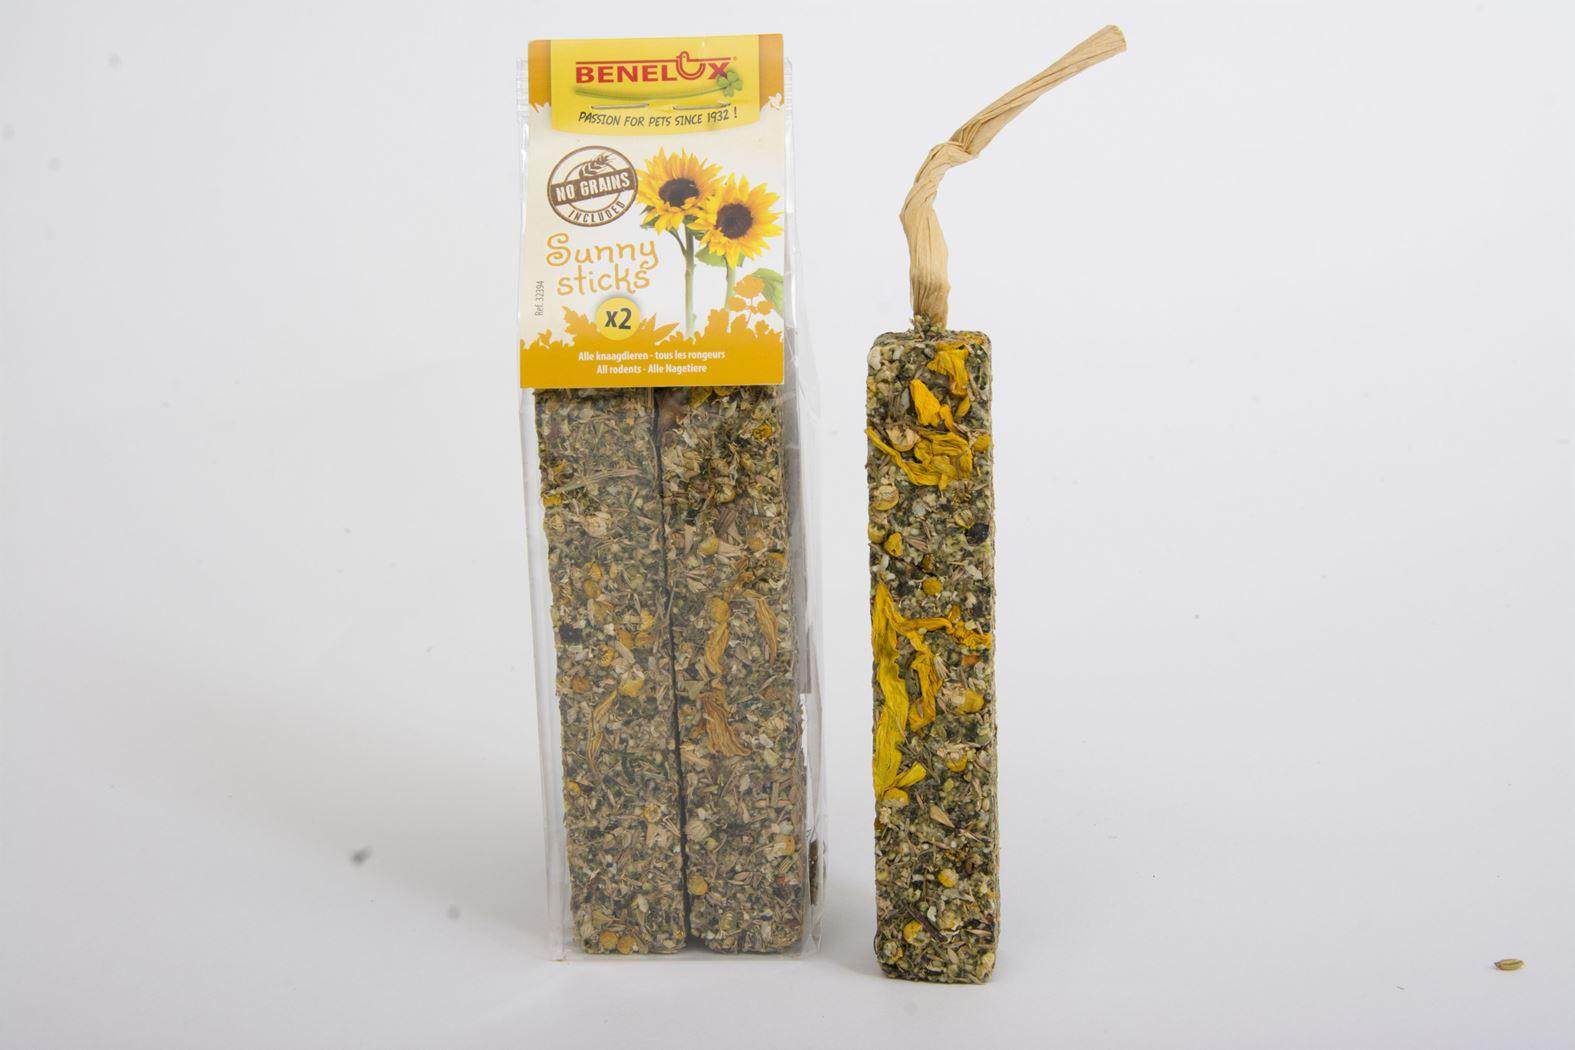 benelux sticks sunny grain free (2sts)